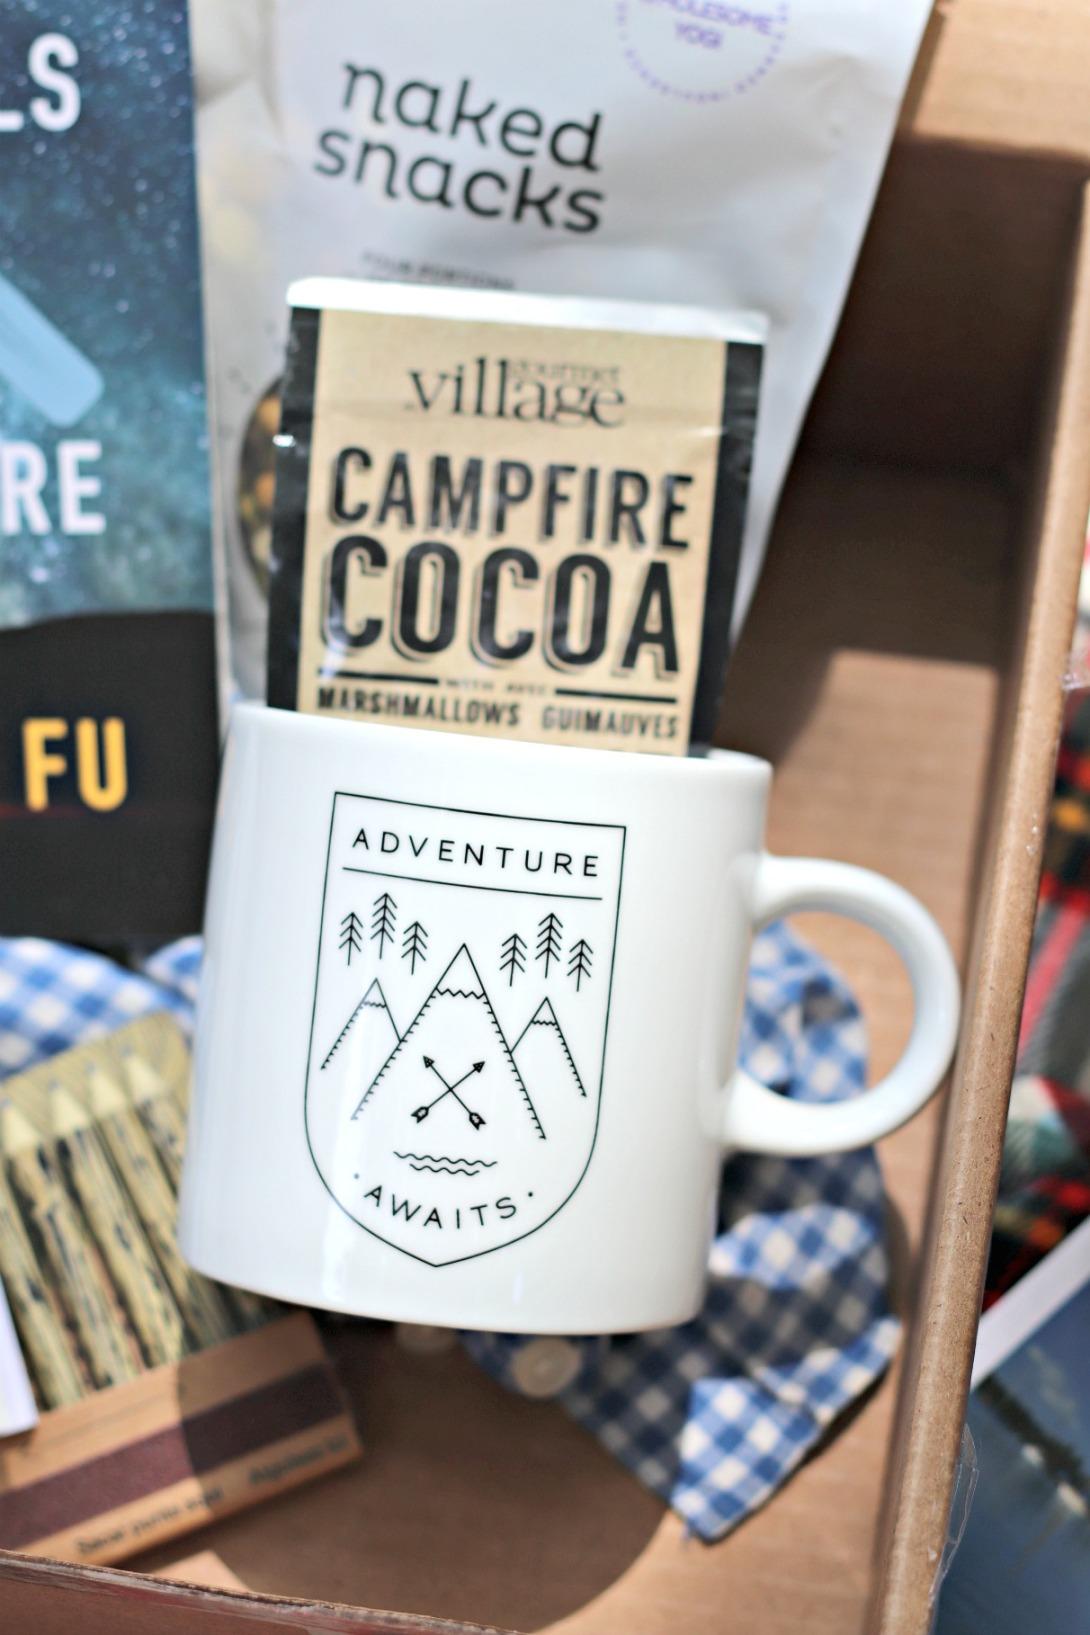 Sweet Reads Box June 18 Gourmet du Village campfire cocoa and Danica Adventure Awaits mugs